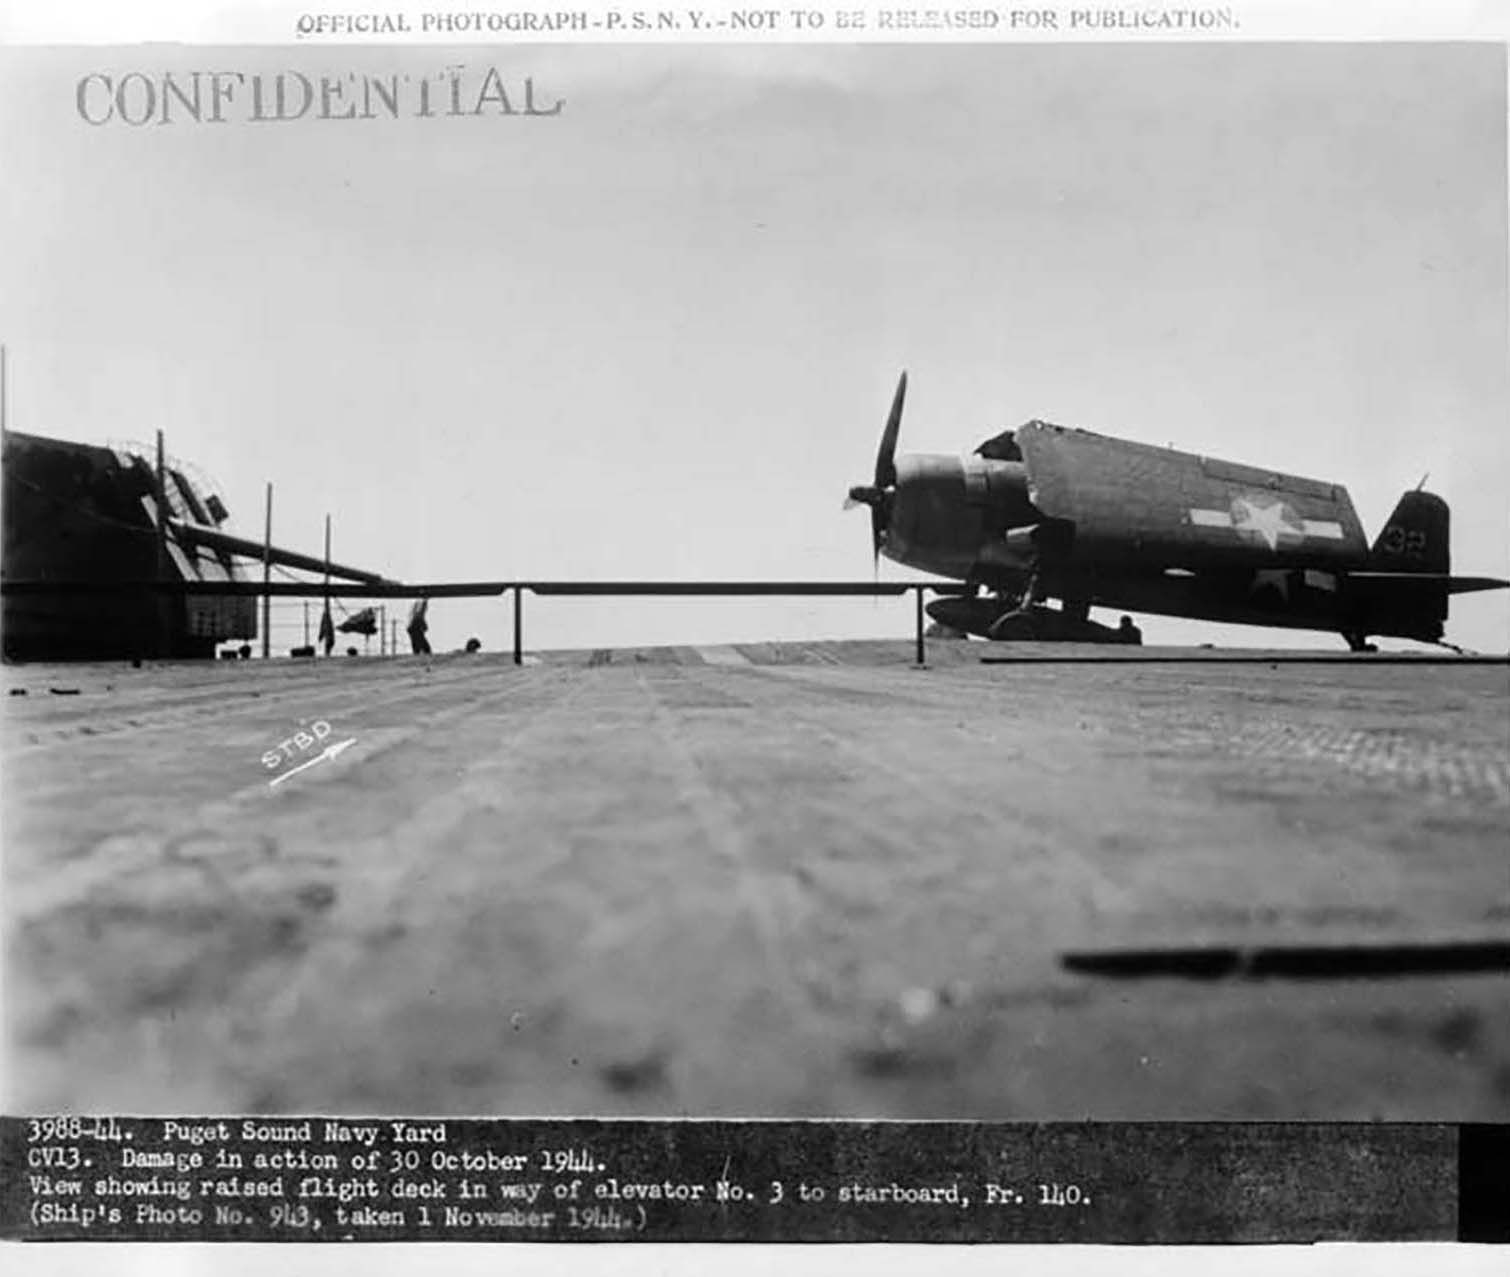 CV 13 USS Franklin nicknamed Big Ben battle damaged 30th Oct 1944 02